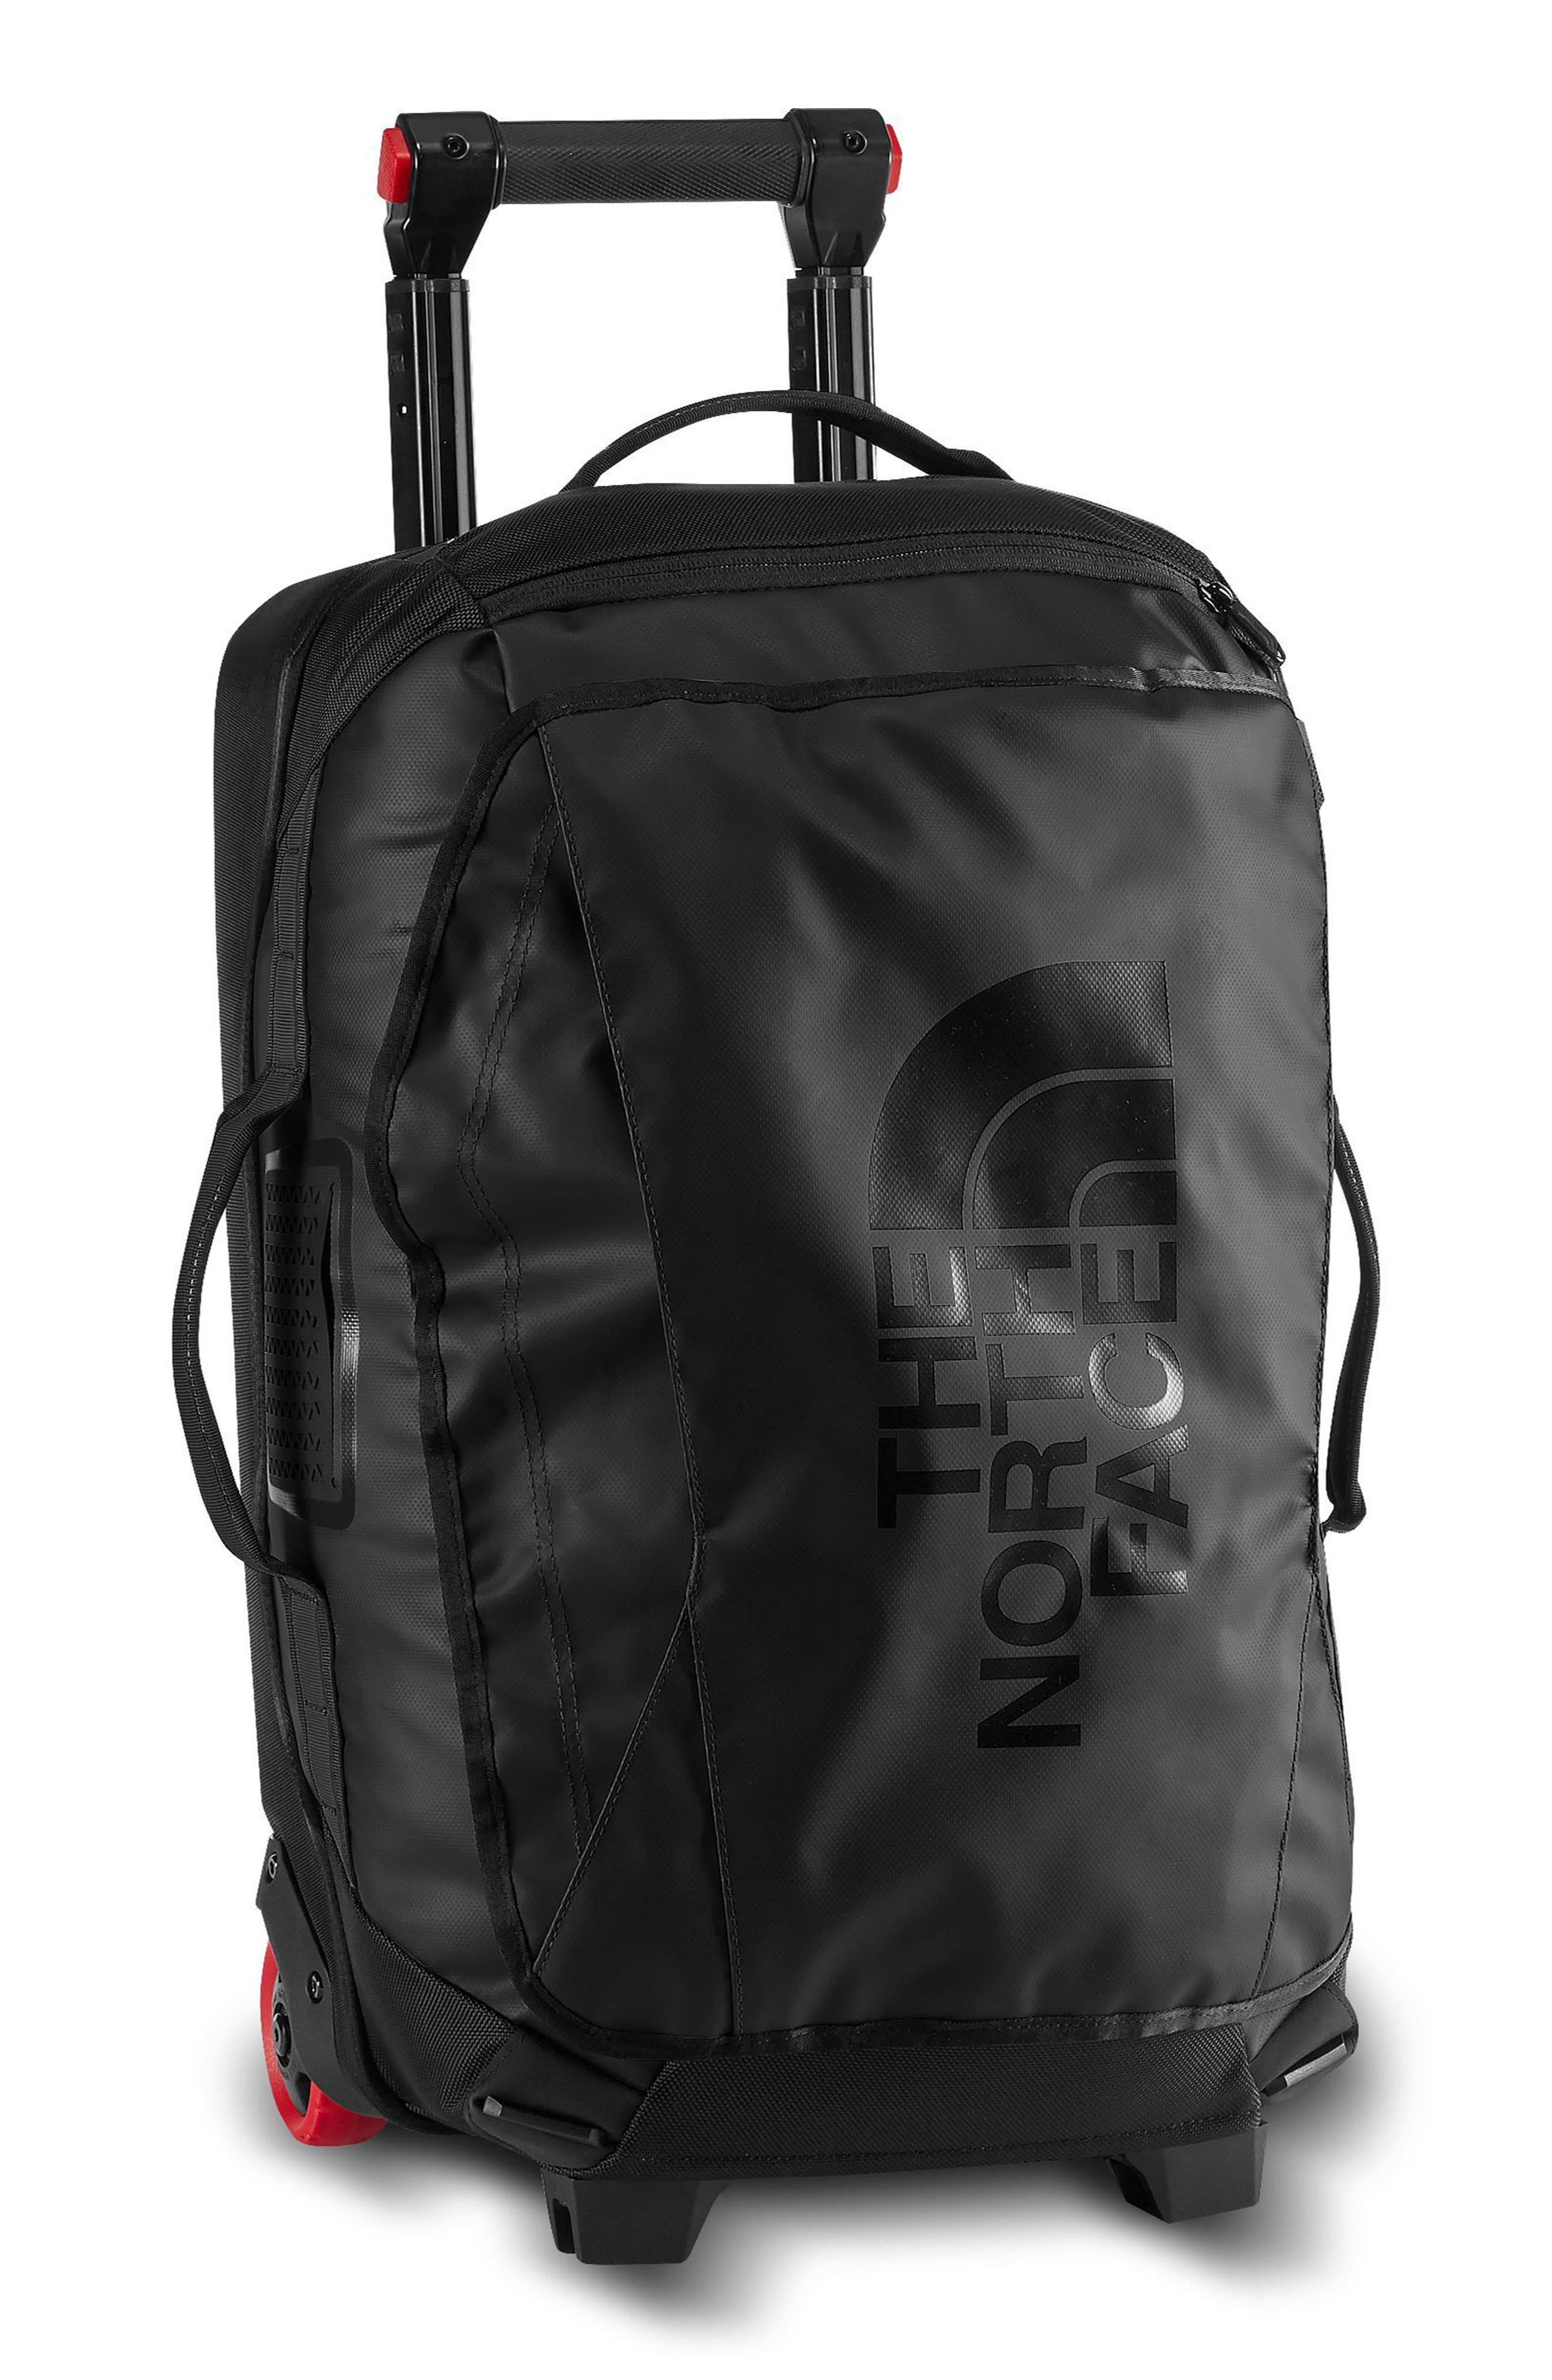 Rolling Thunder Wheeled Duffel Bag,                         Main,                         color, Tnf Black